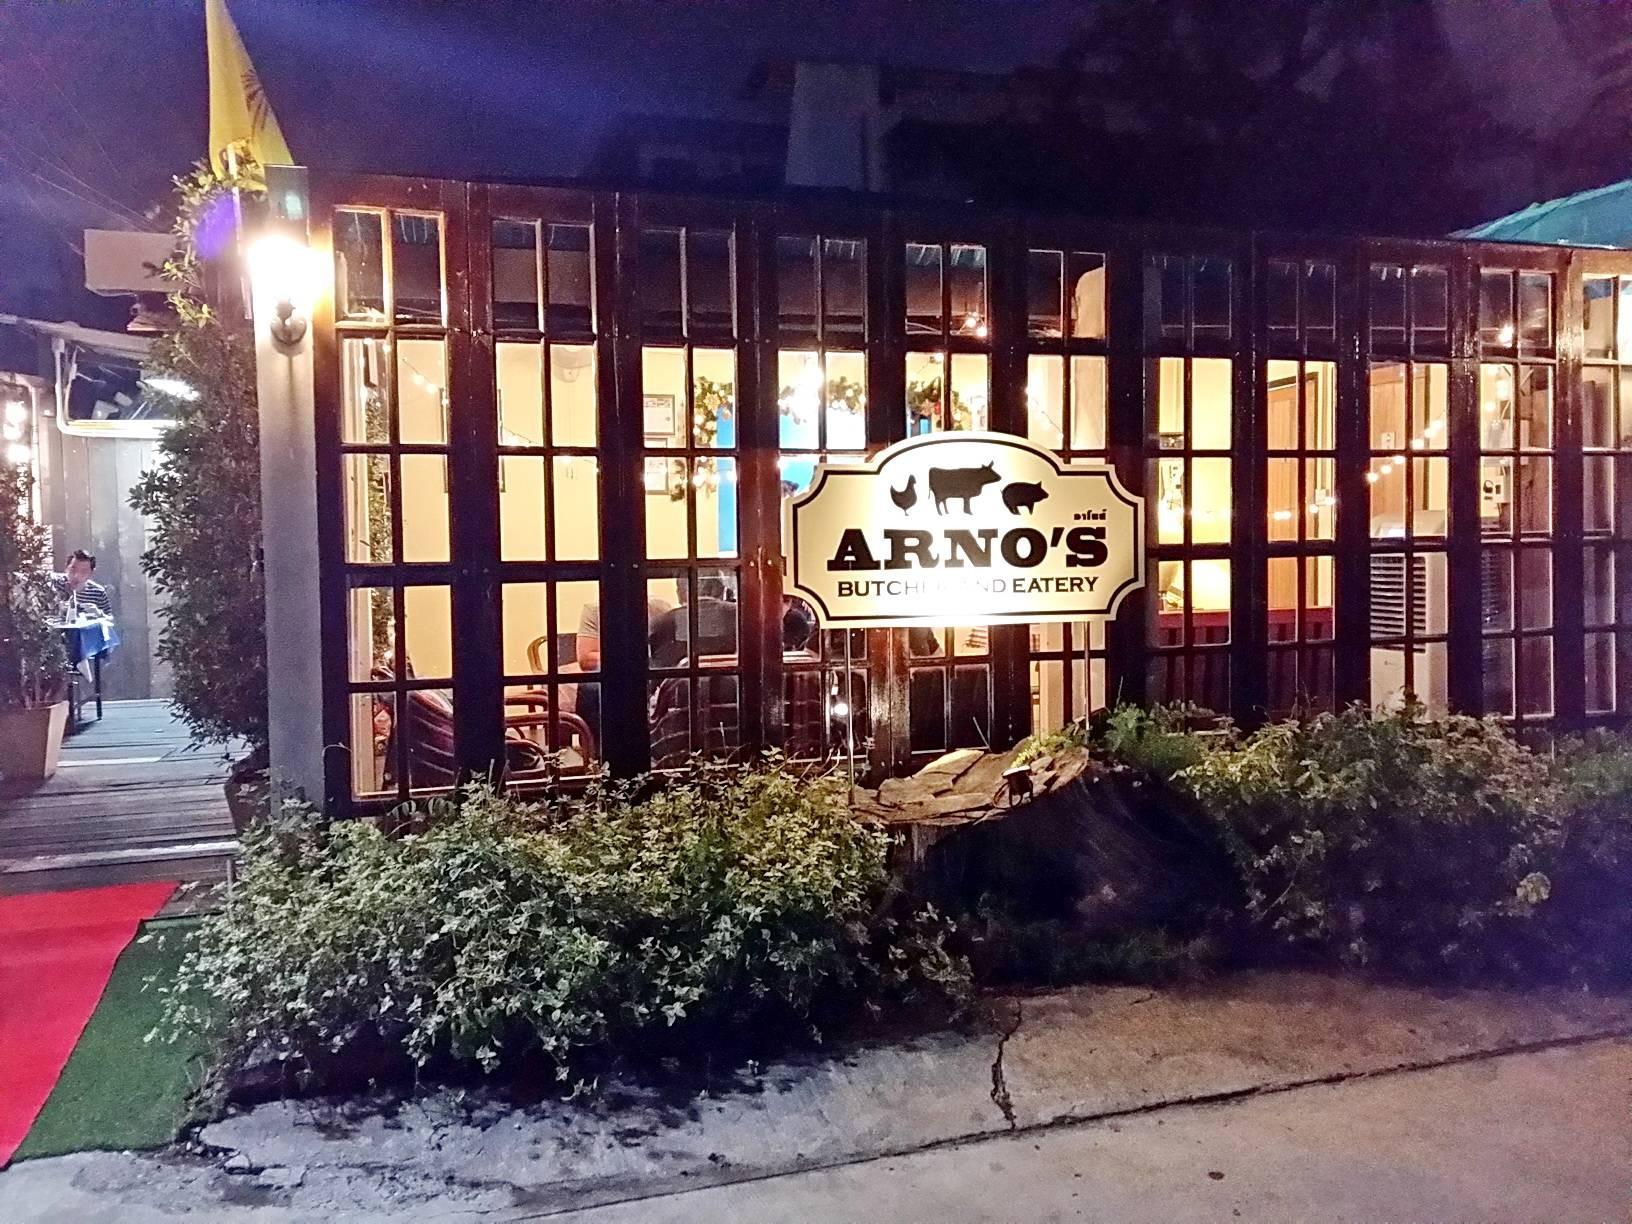 Arno's Butcher and Eatery ซอย นราธิวาสราชนครินทร์ 20